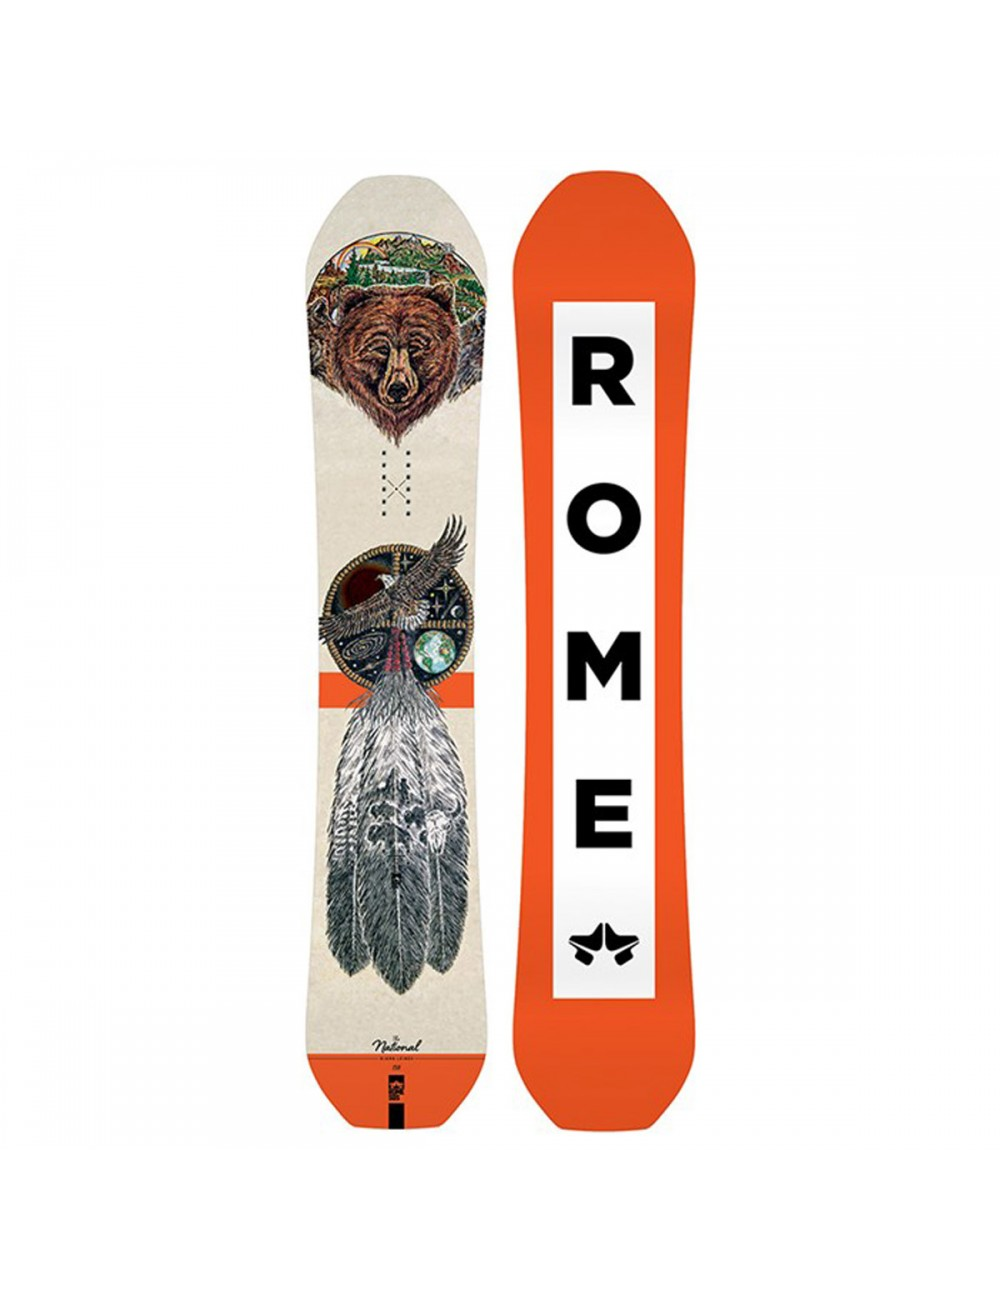 Rome National Bjorn Board_1001109